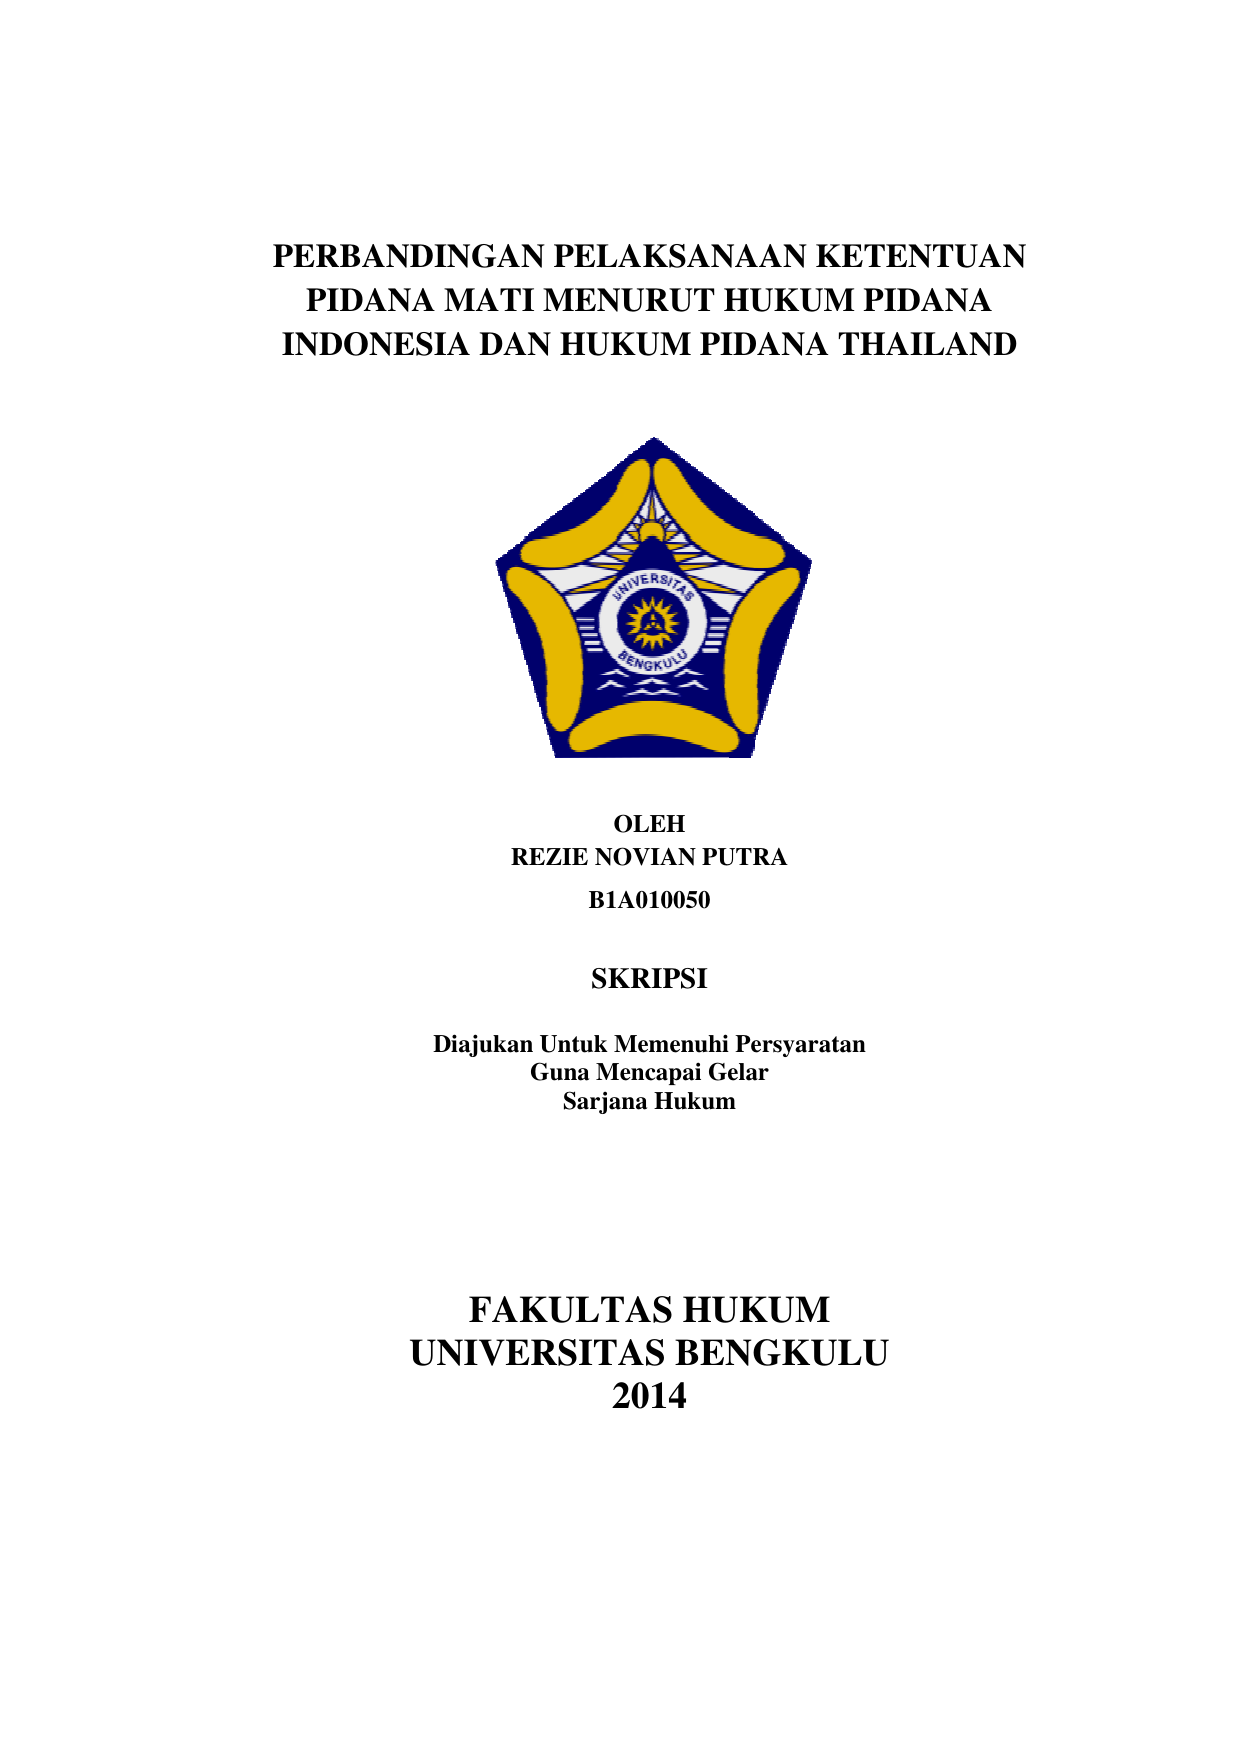 Fakultas Hukum Universitas Bengkulu 2014